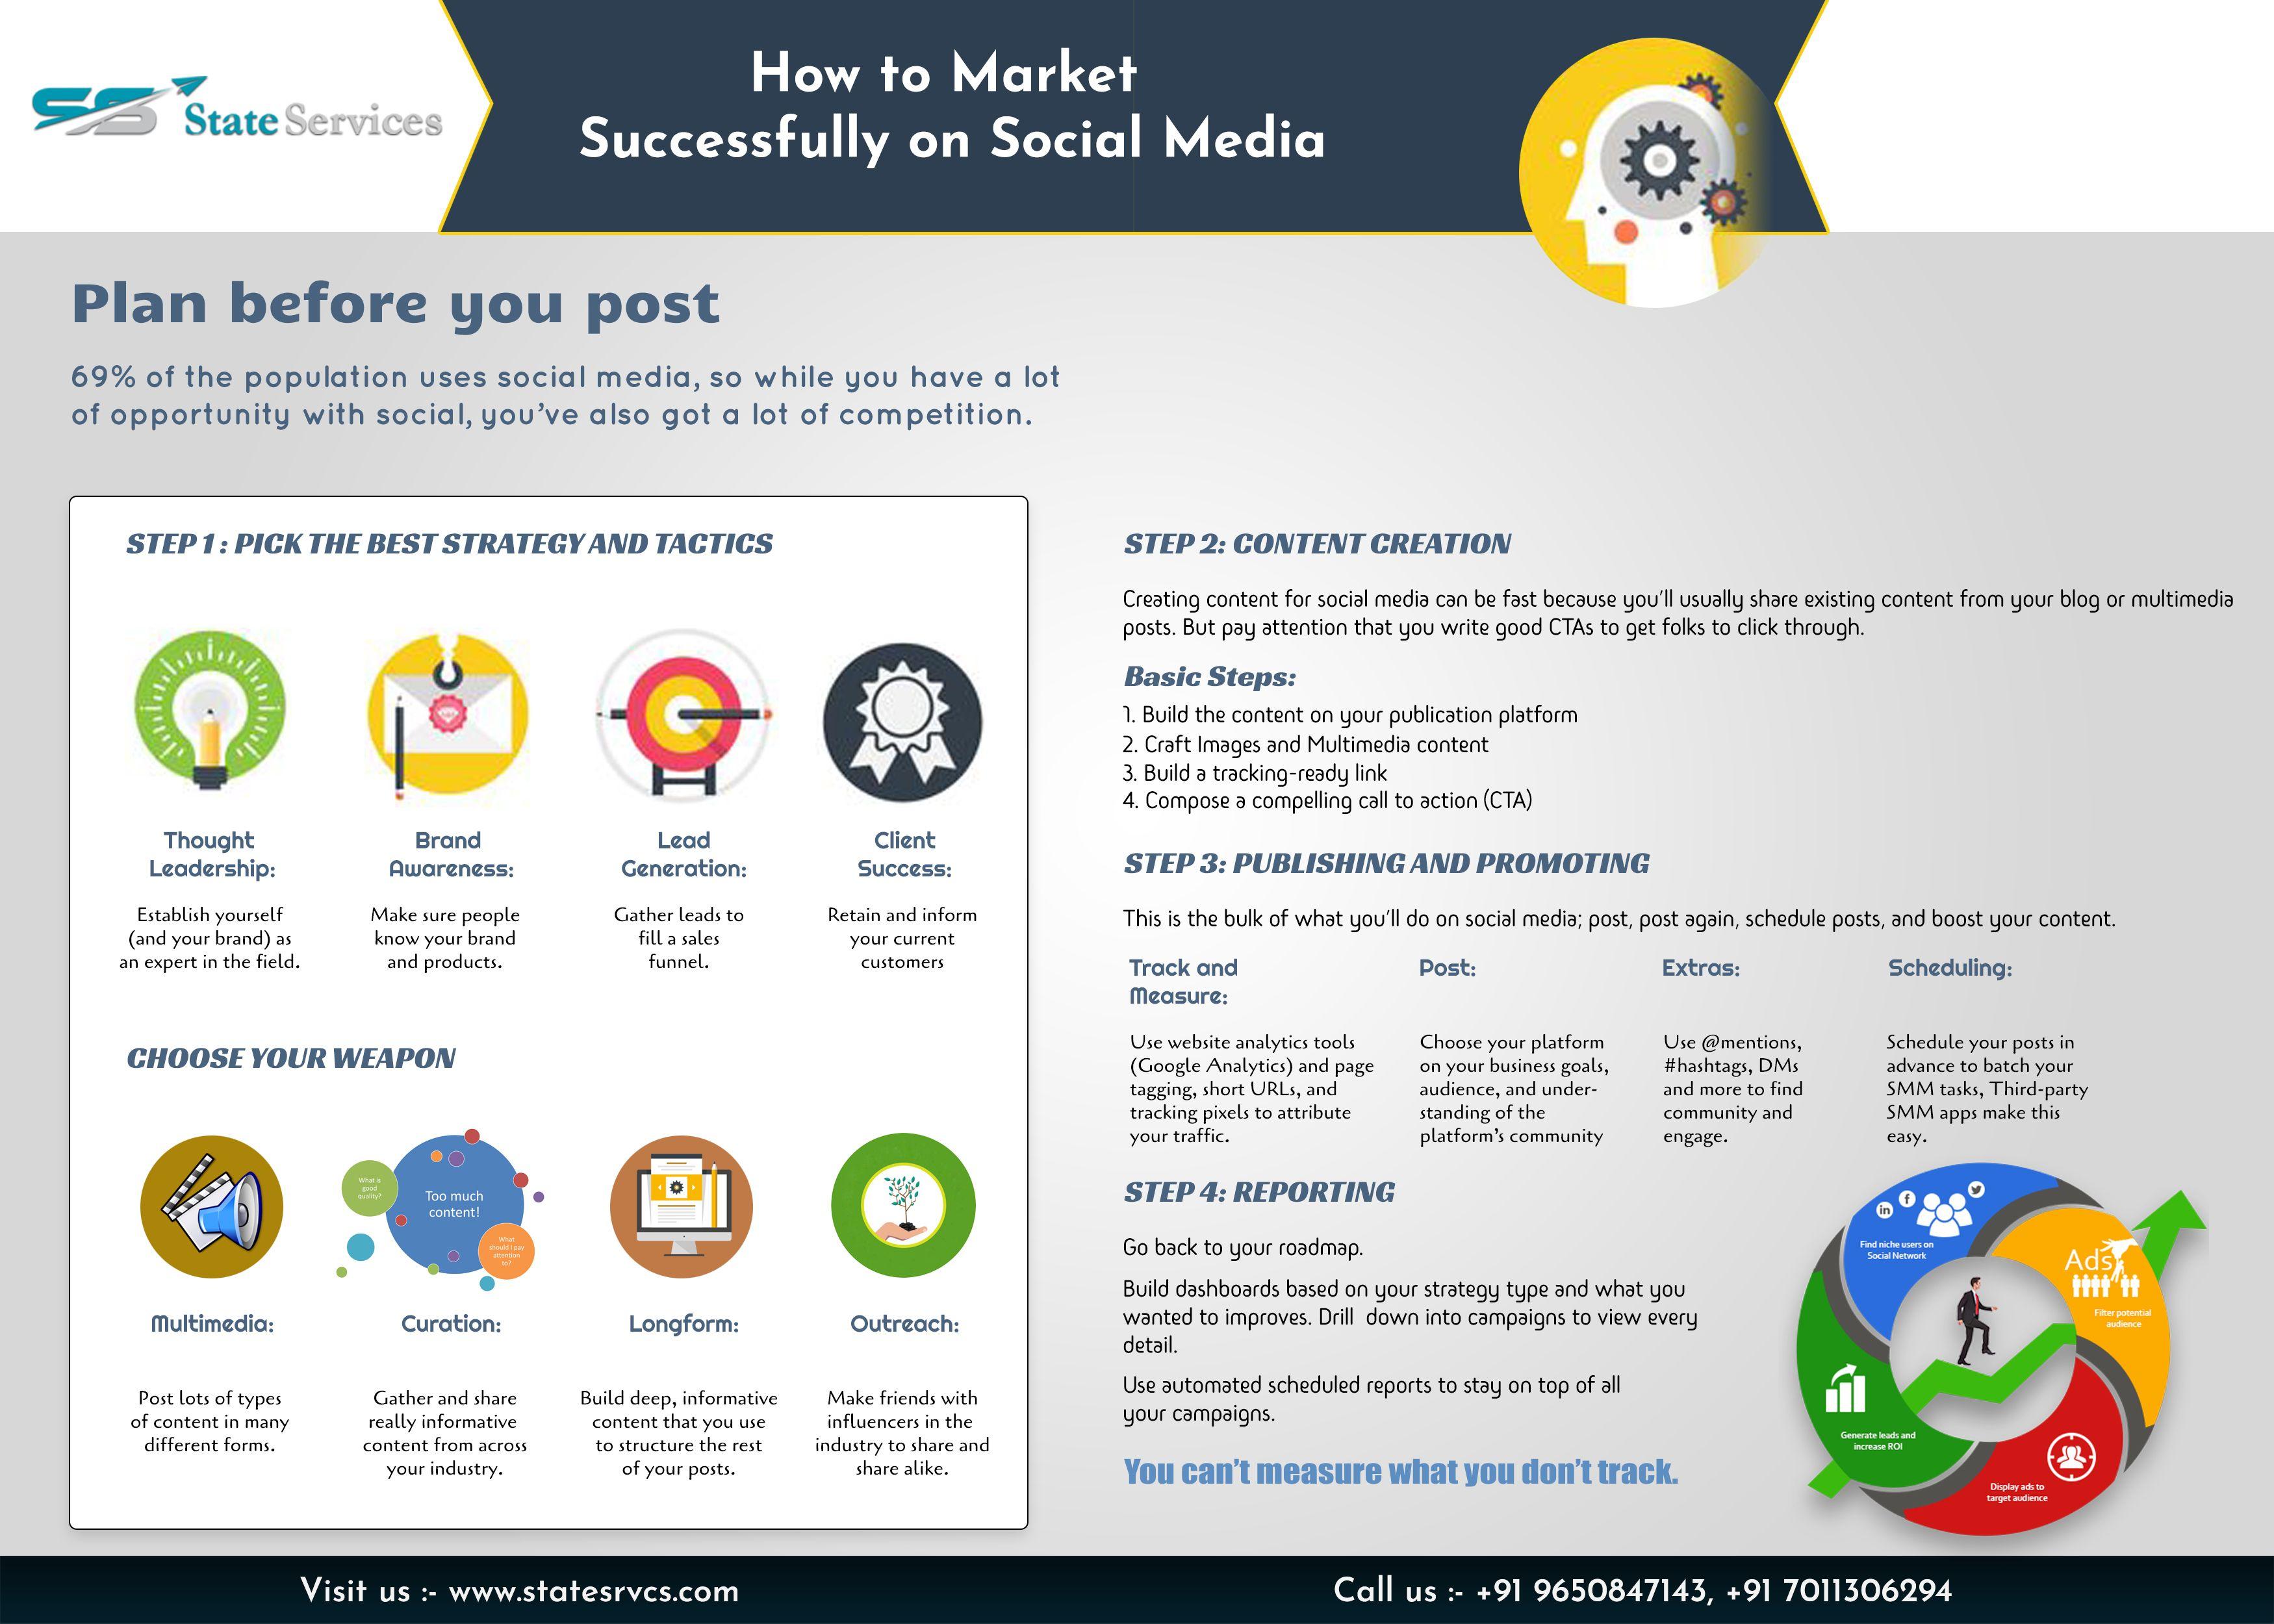 StateServices #freelance #digital #marketing #SEO #PPC #affiliate